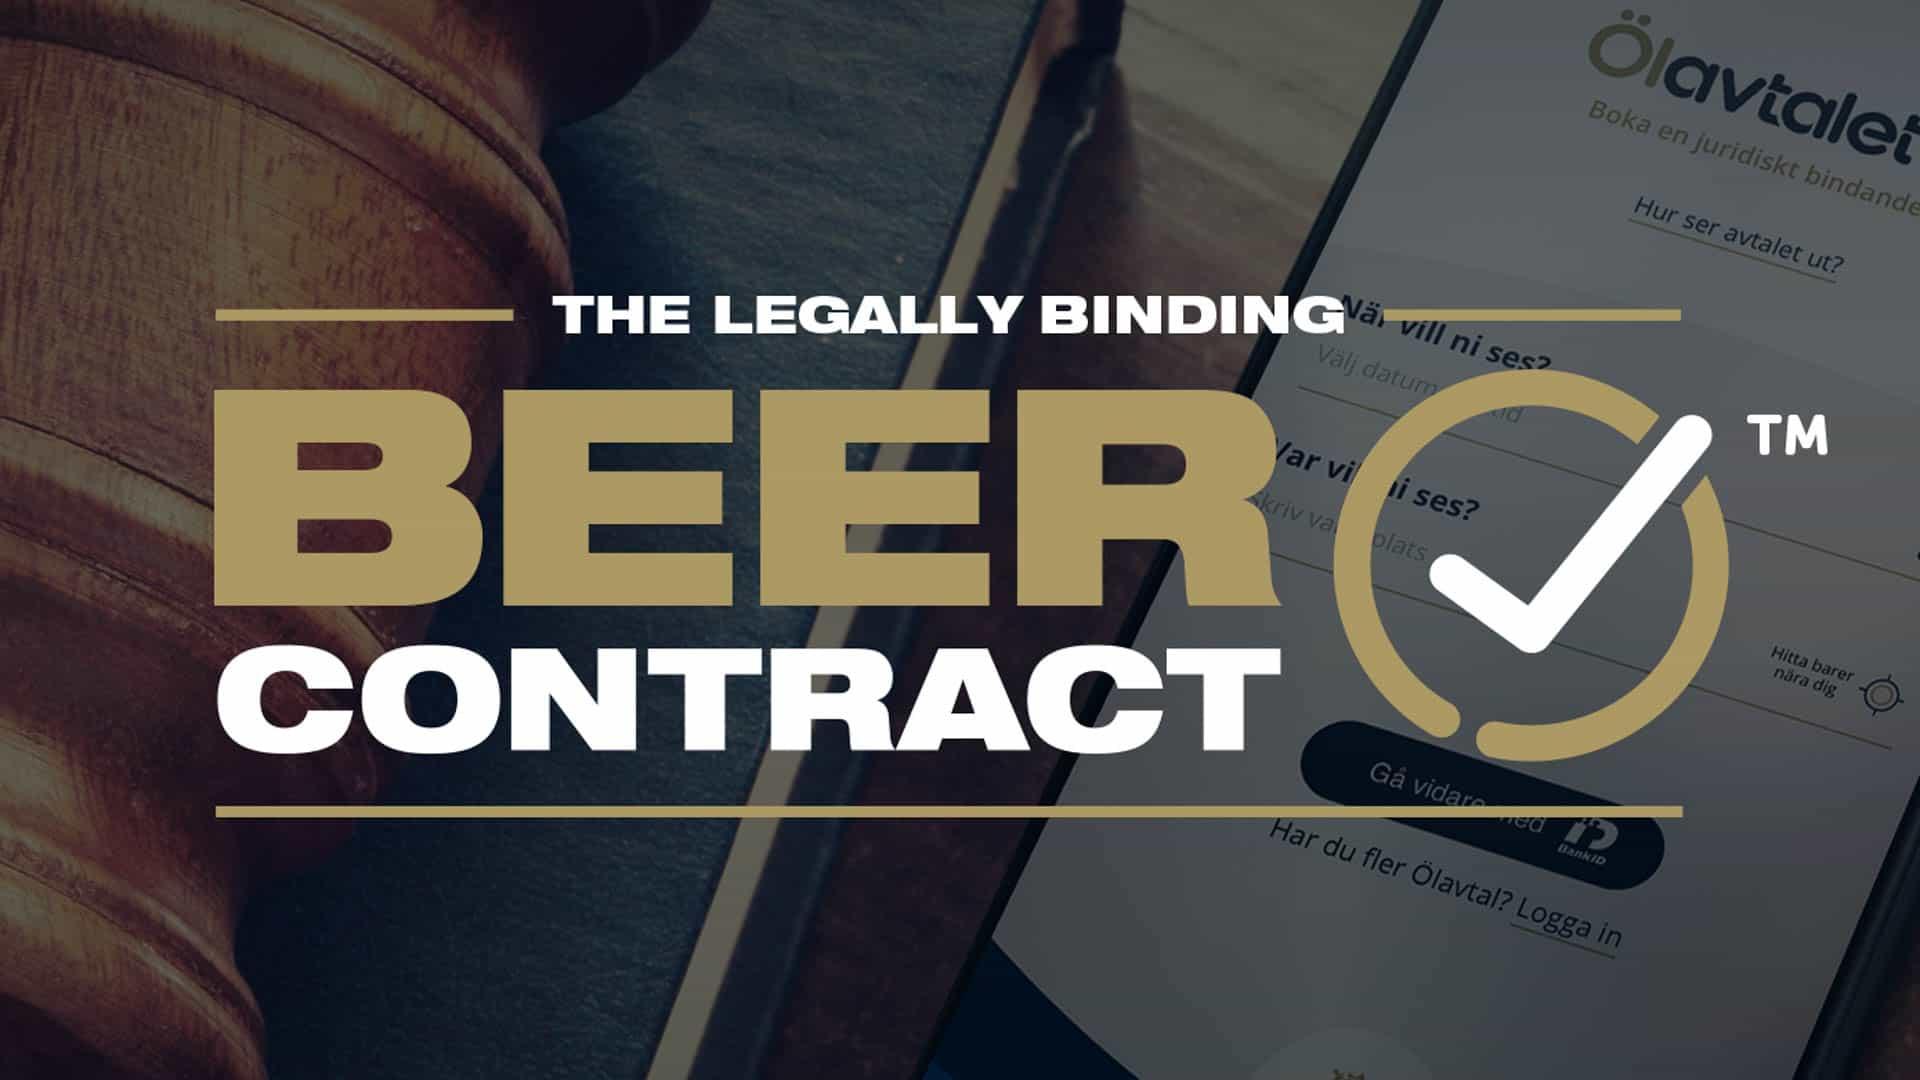 Hackvertising ถ้าเบี้ยวนัดดื่มเบียร์งั้นไปเคลียร์กันที่ศาล – The Legally Binding Beer Contact